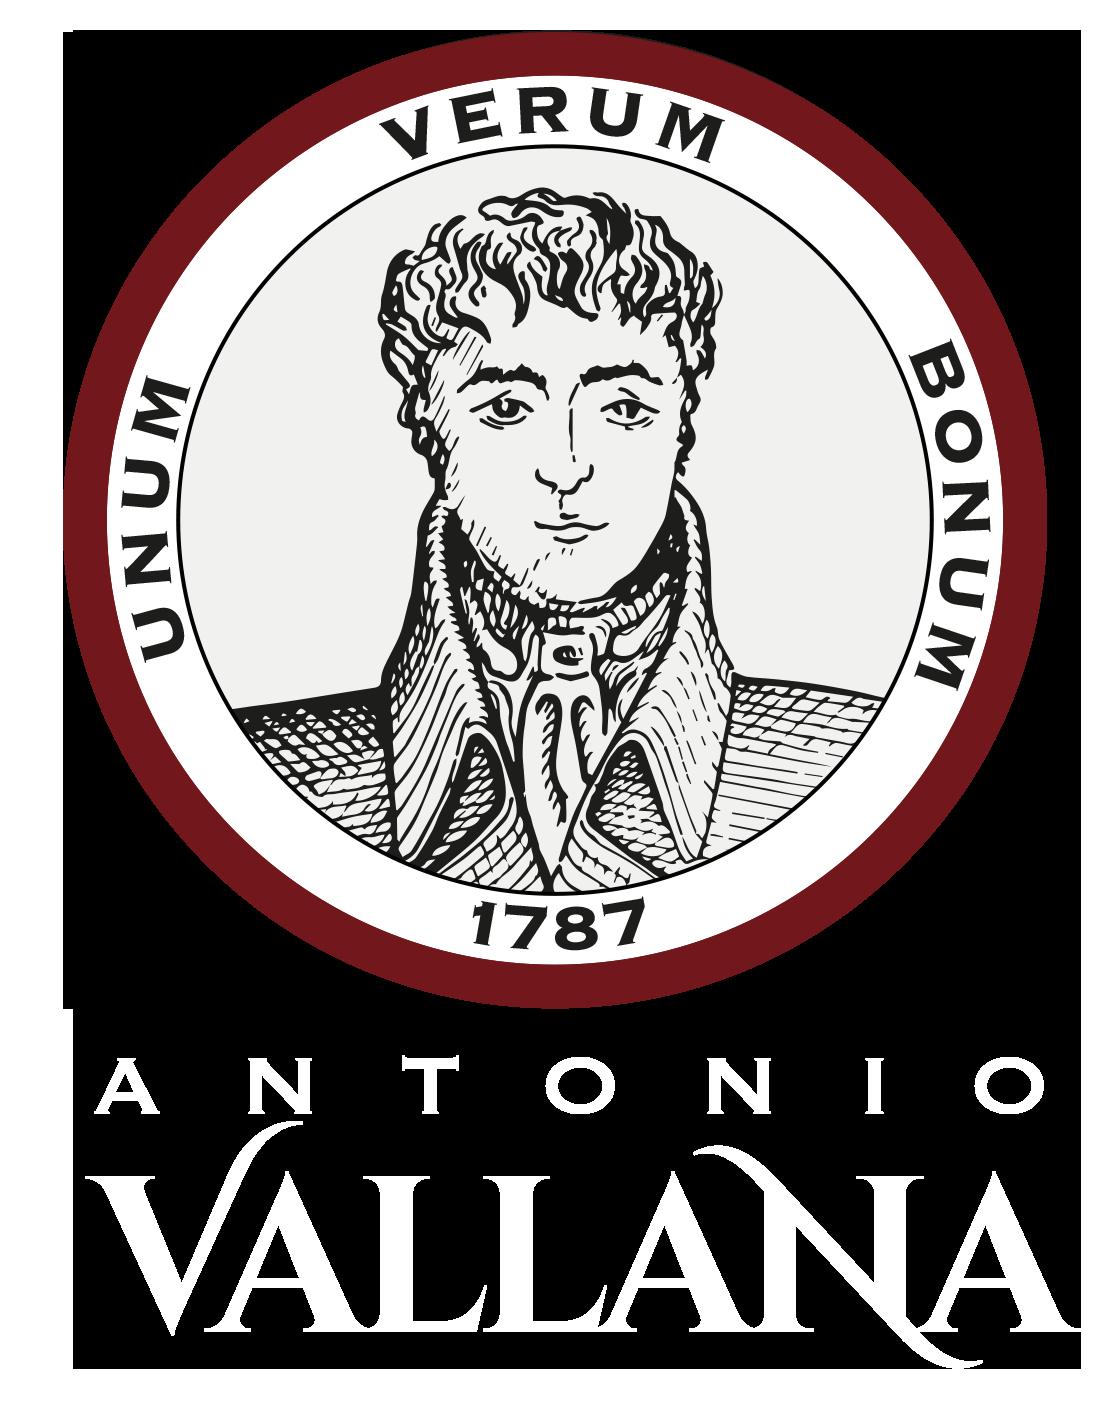 Source: Antonio Vallana